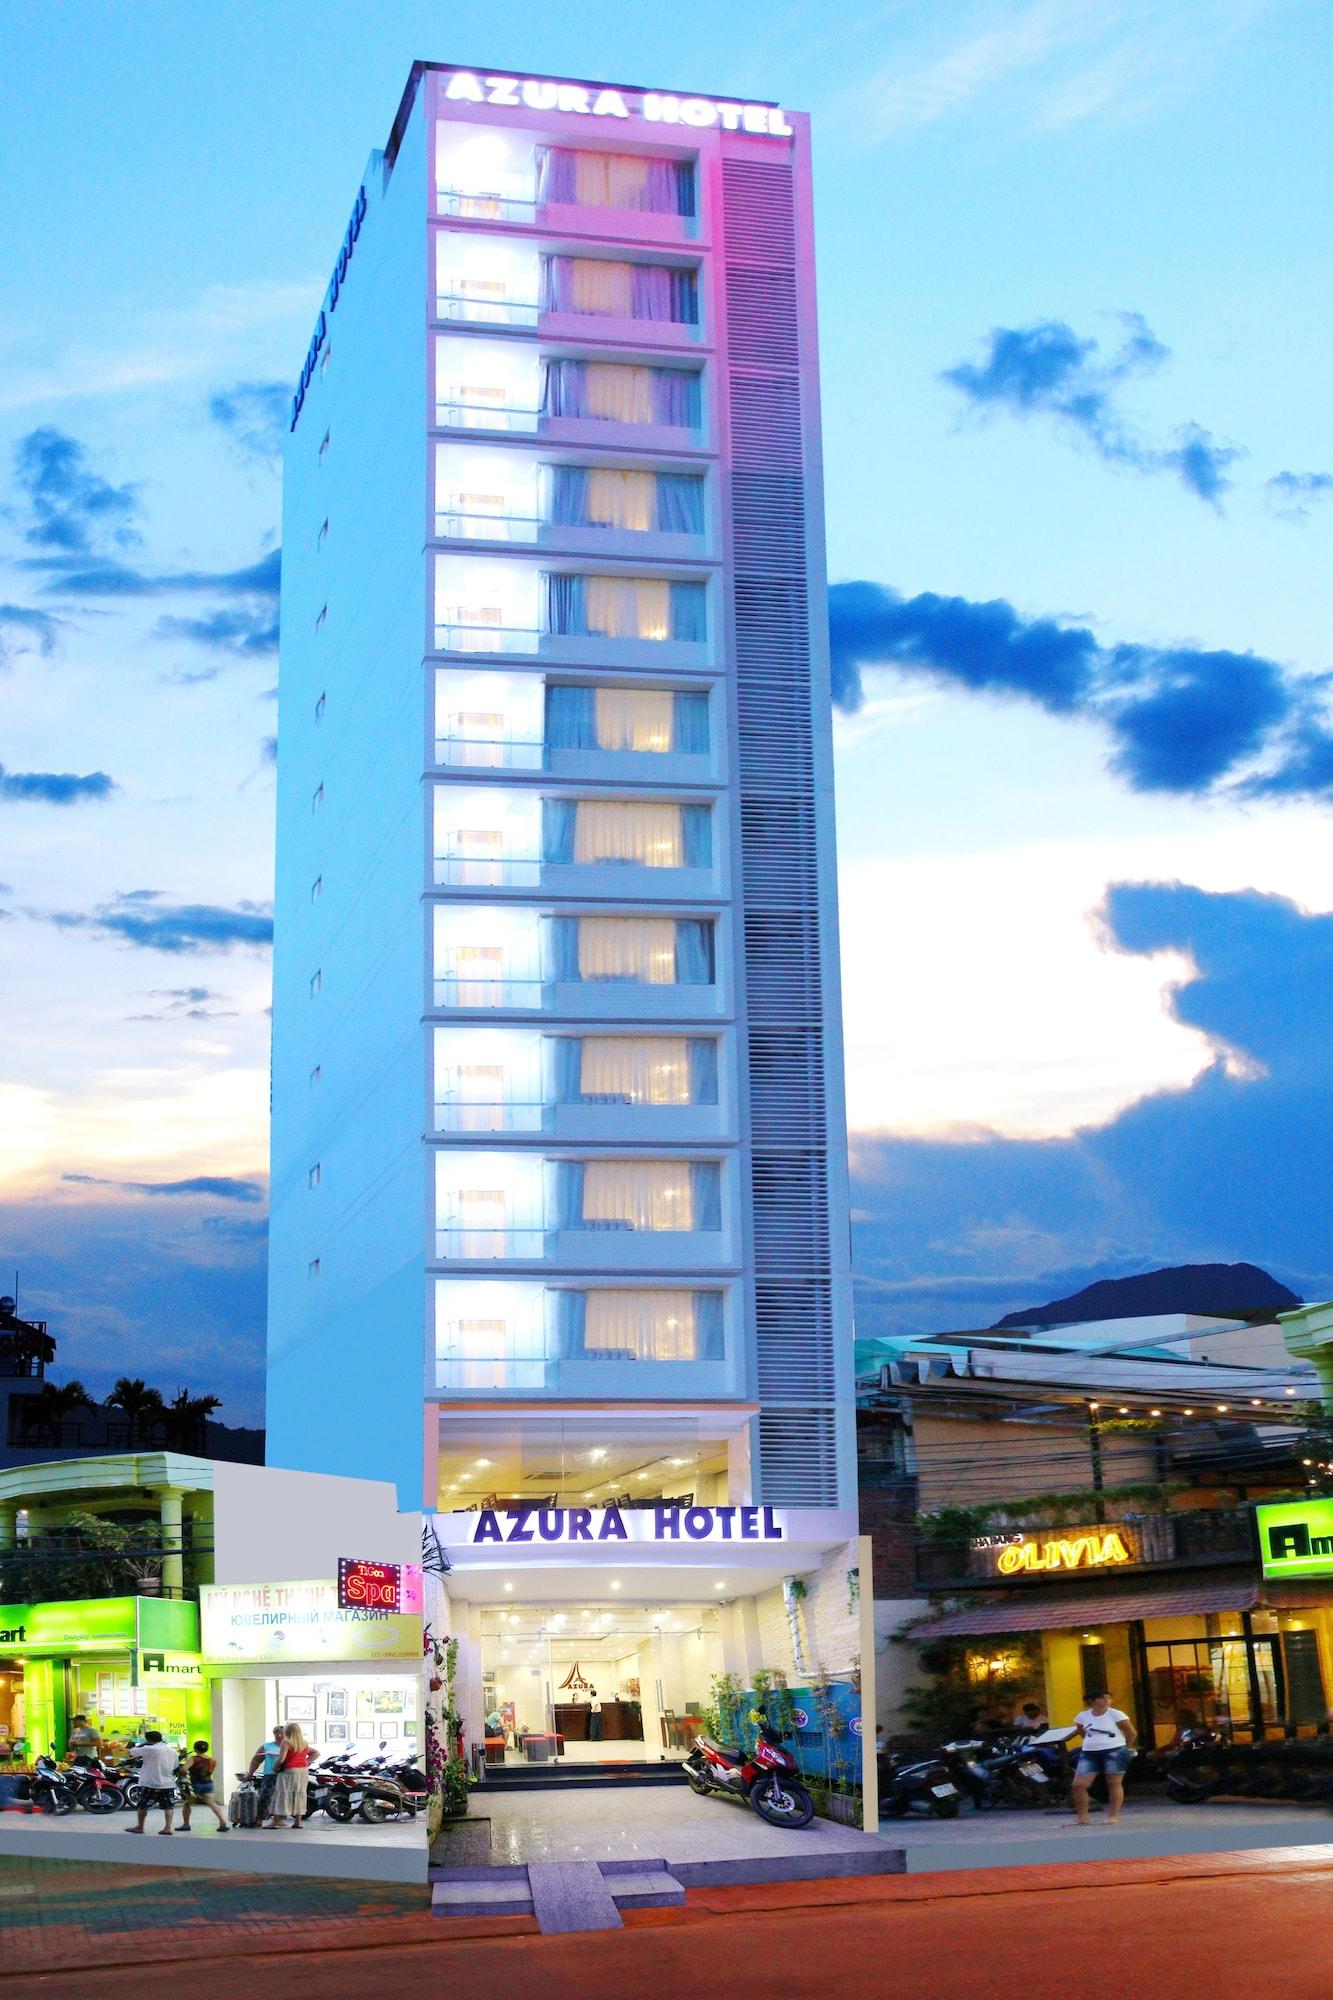 Azura Hotel, Nha Trang